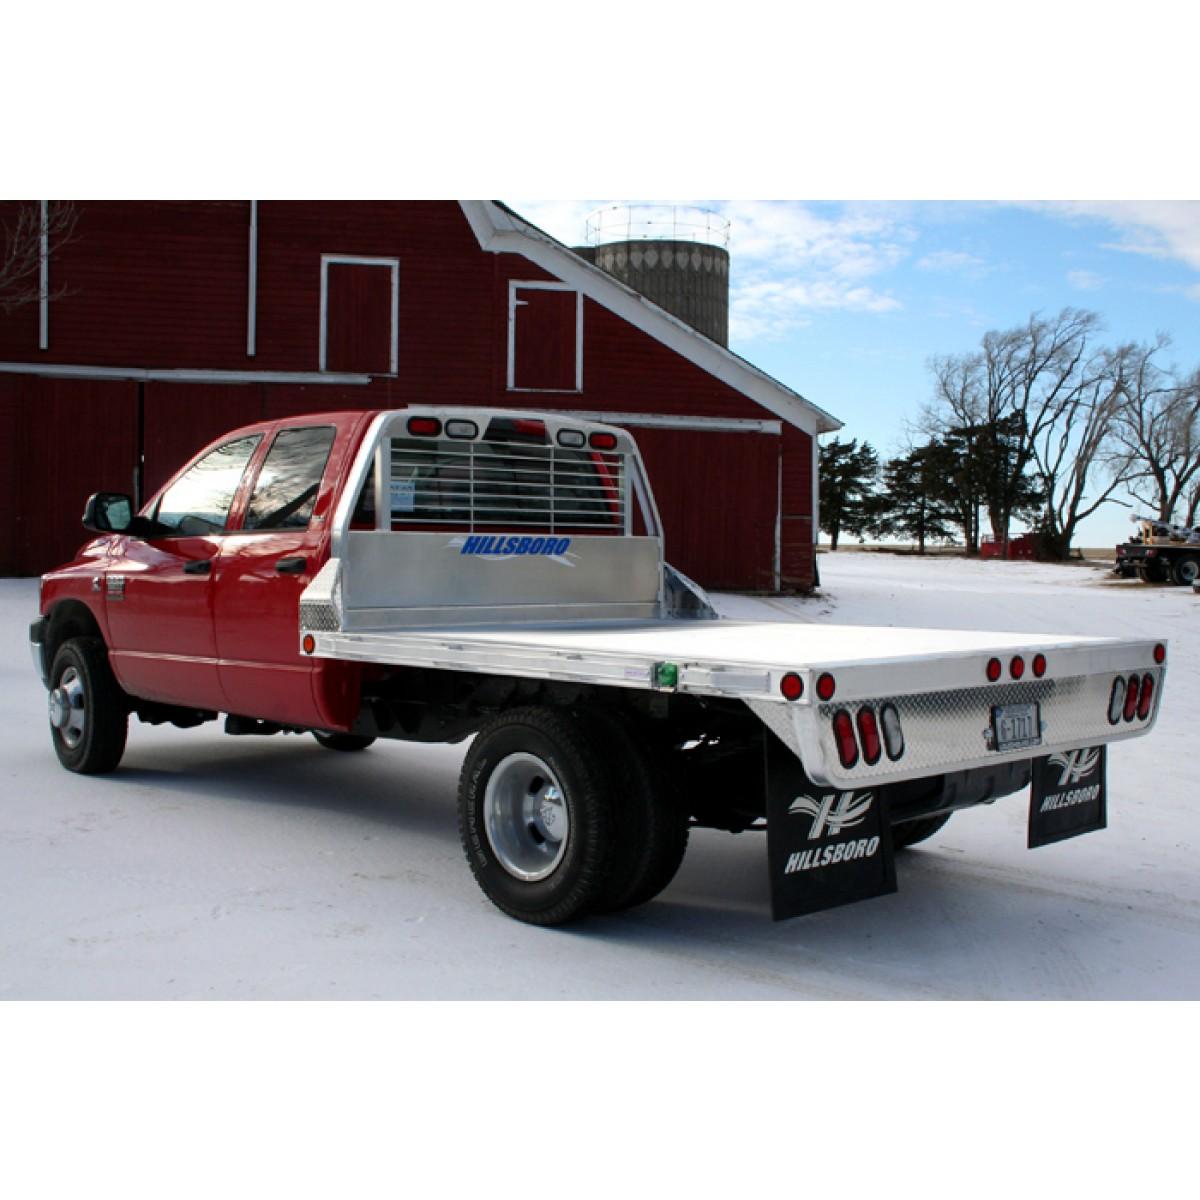 Hillsboro 2000 Series Flat Bed For Pickup